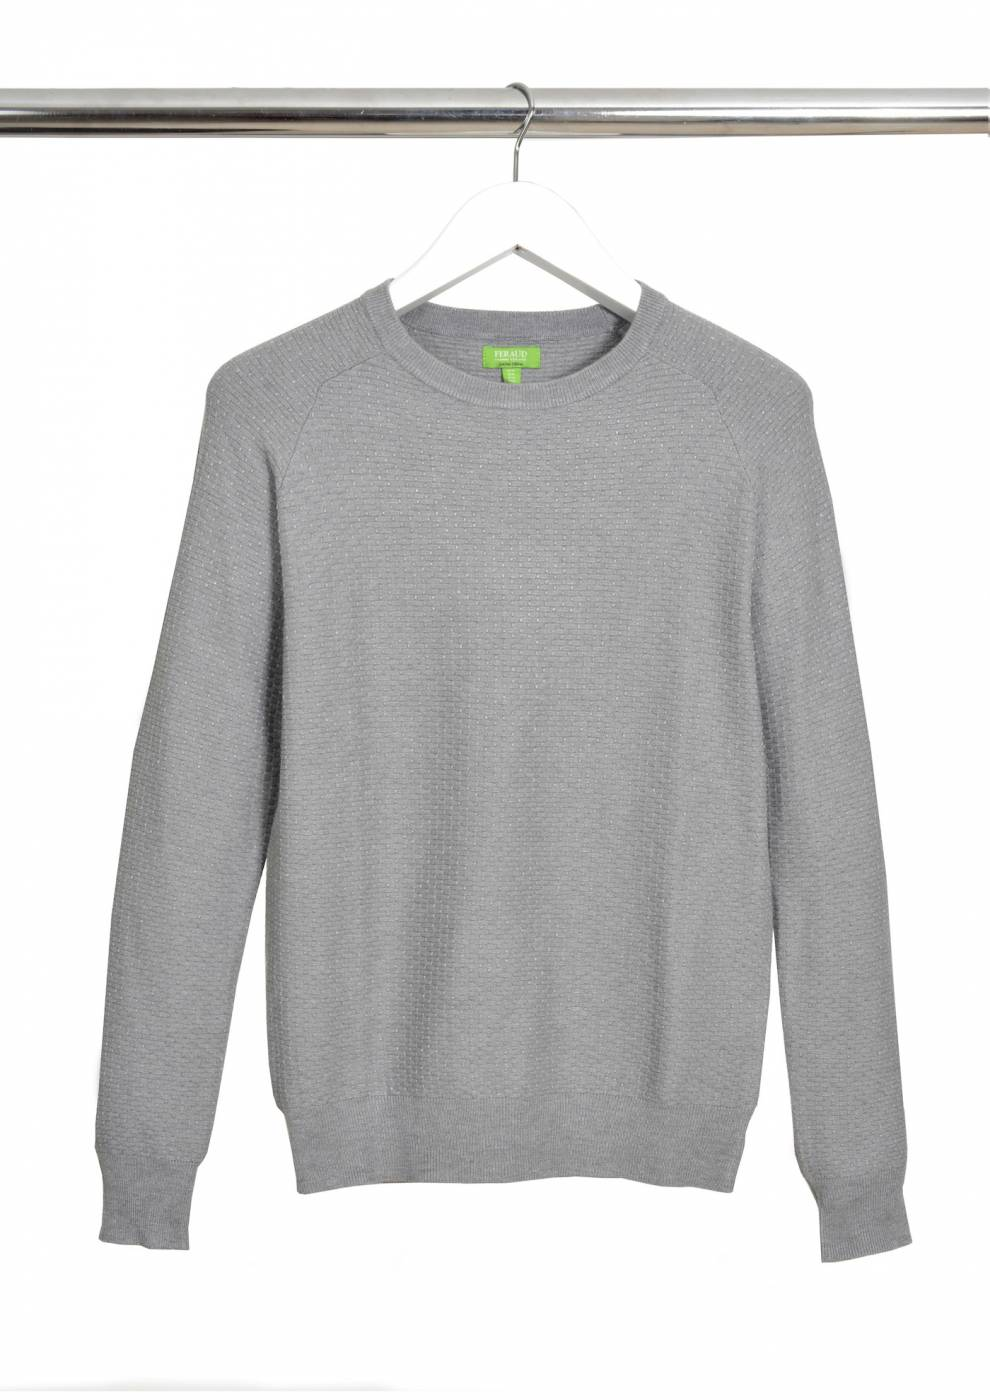 7.Bale-Grey-small